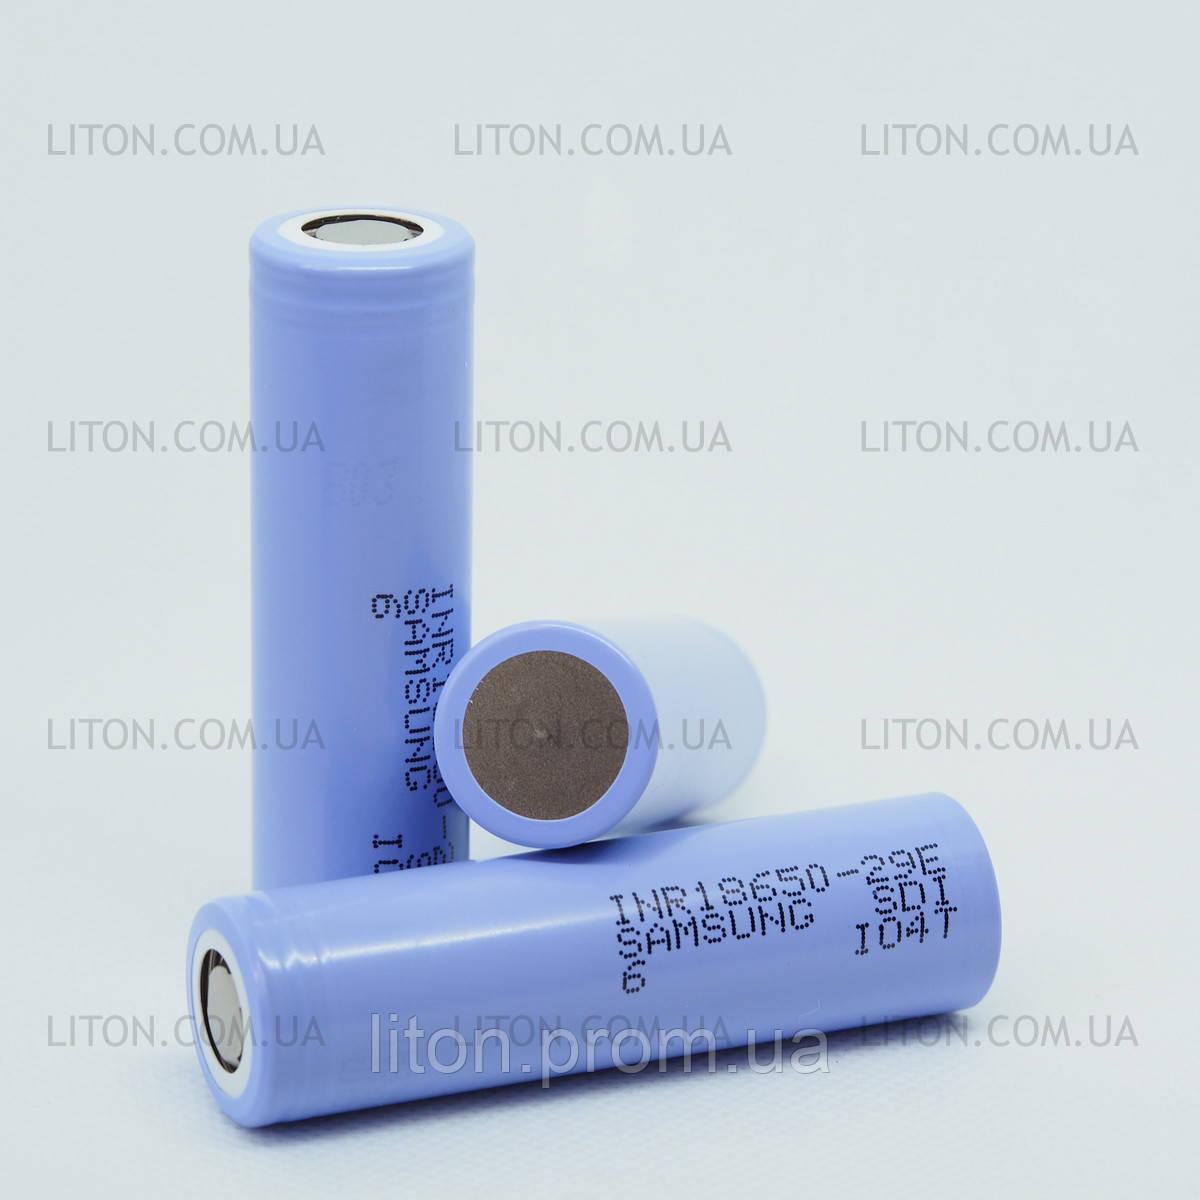 Аккумулятор Samsung 29E 18650 на 2900 mAh Слаботоковые (8А)